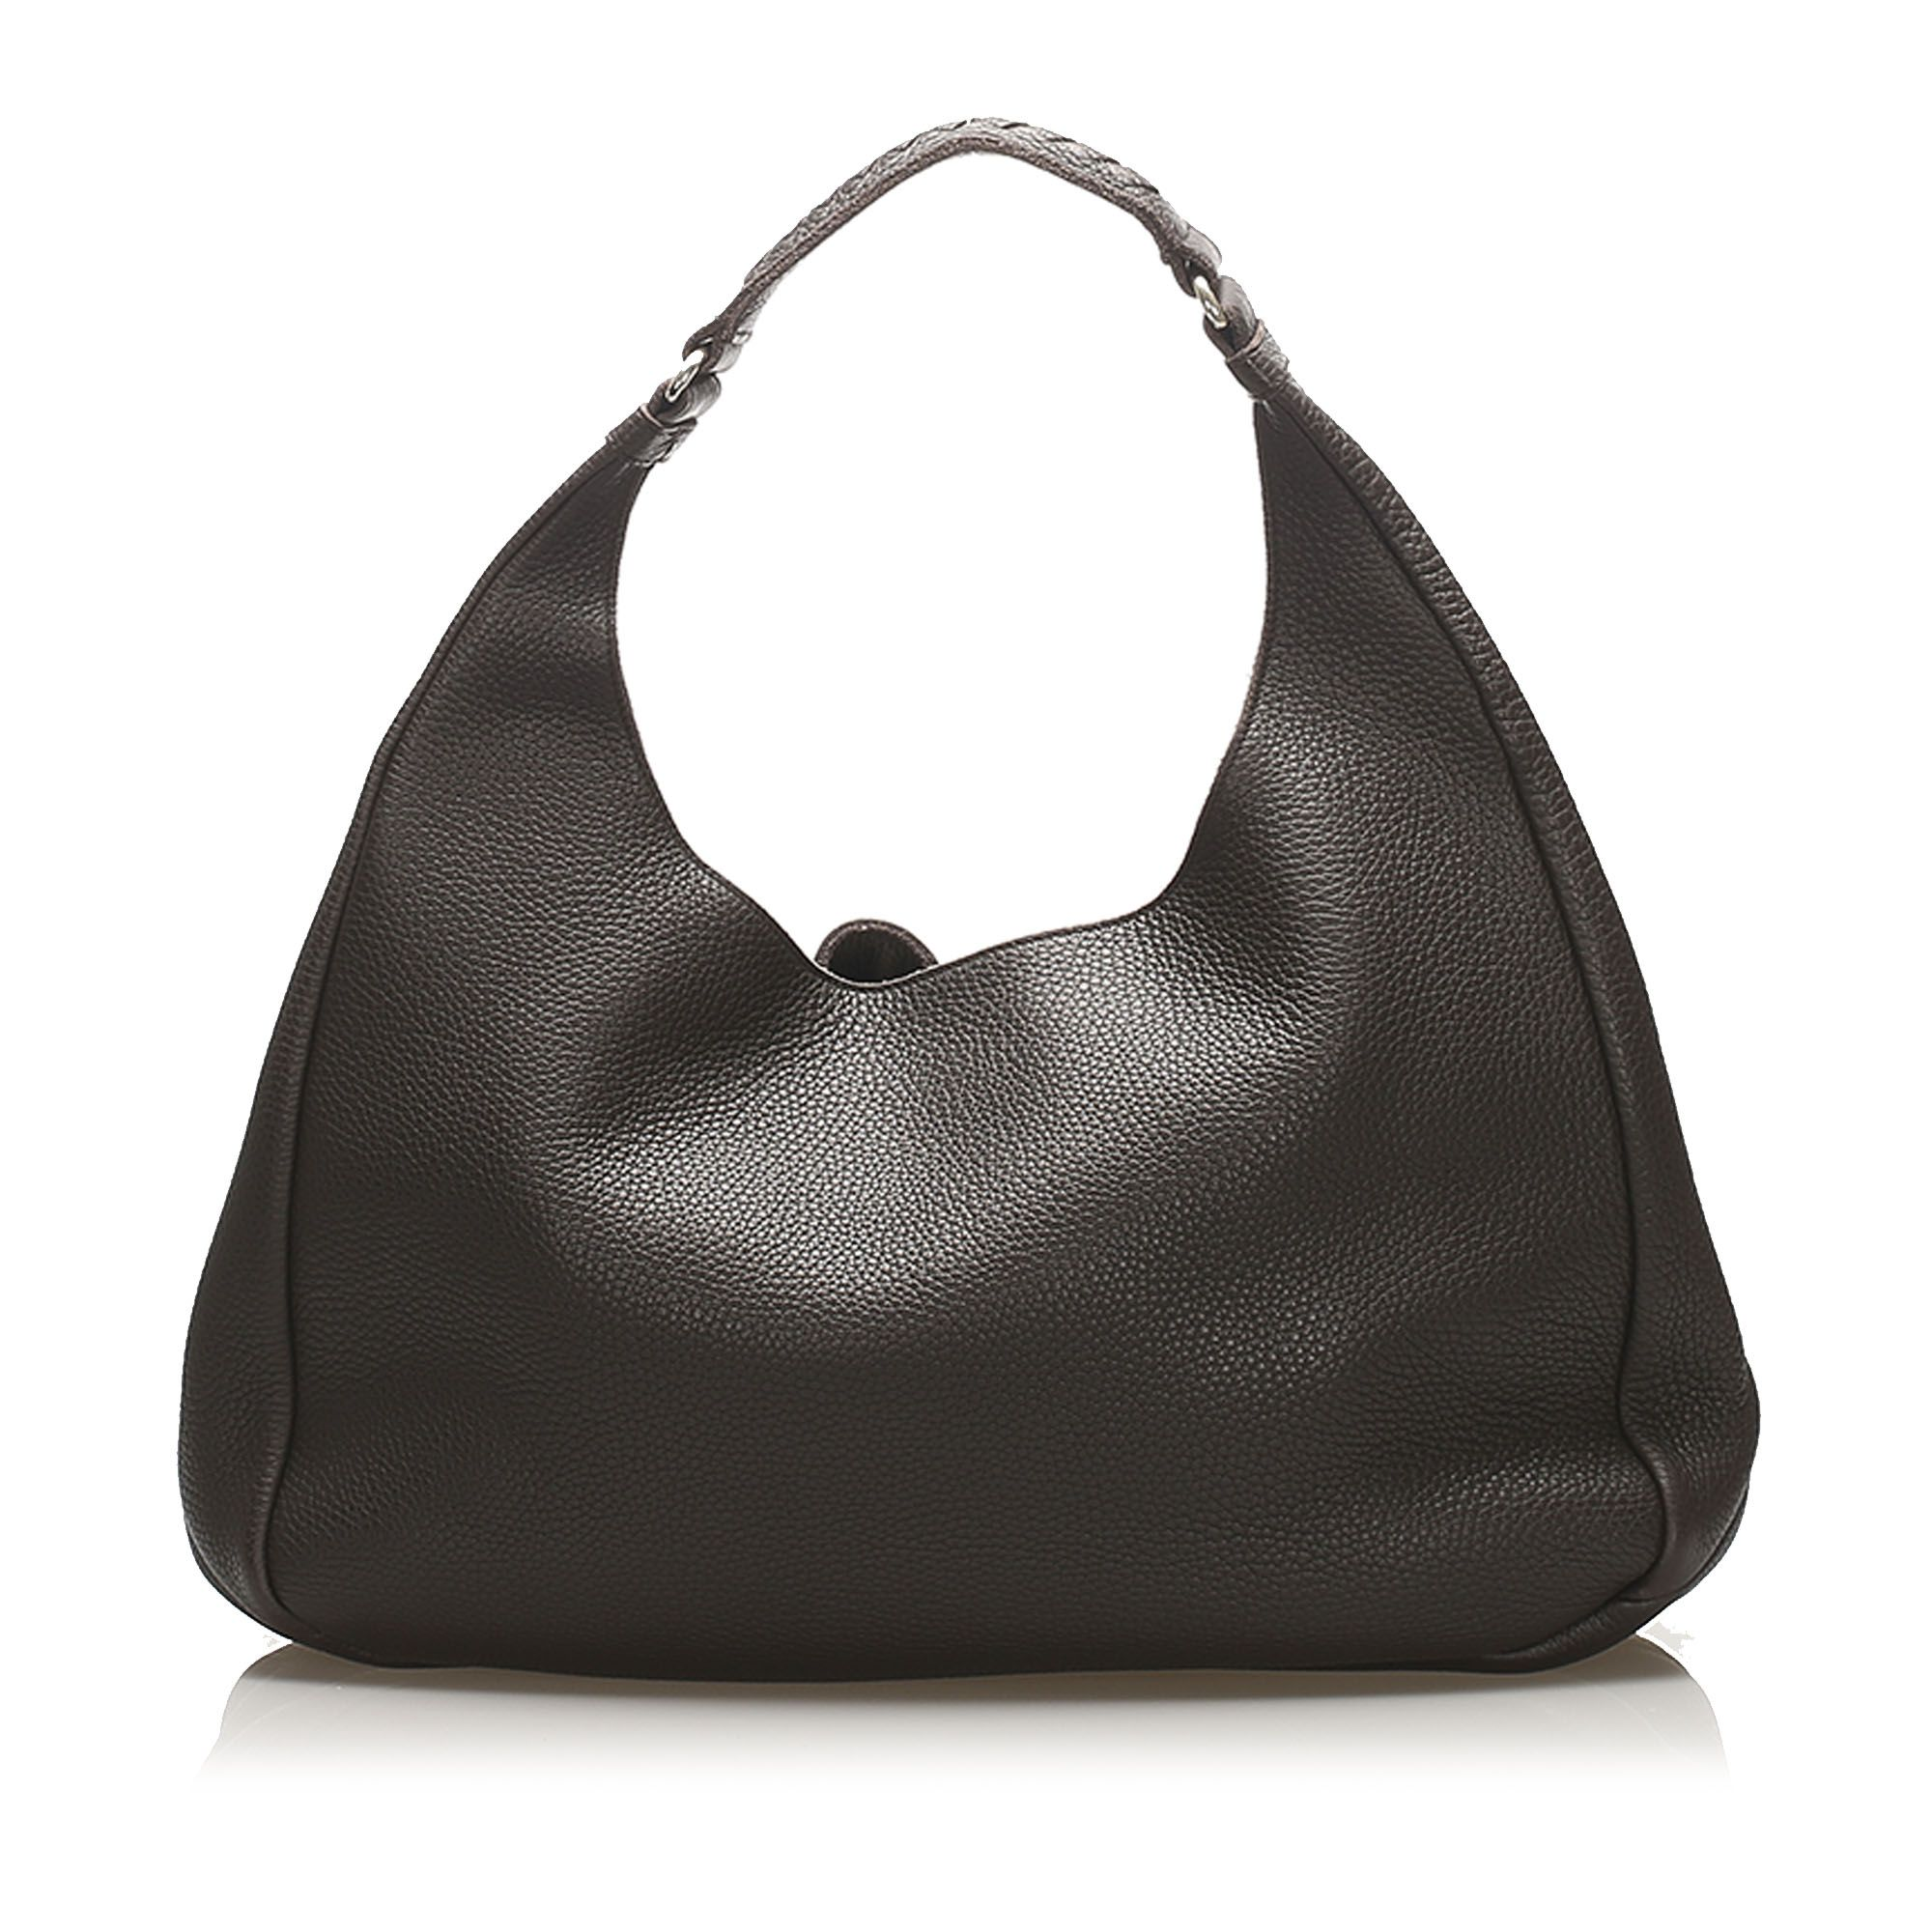 Vintage Bottega Veneta Campana Leather Hobo Bag Brown